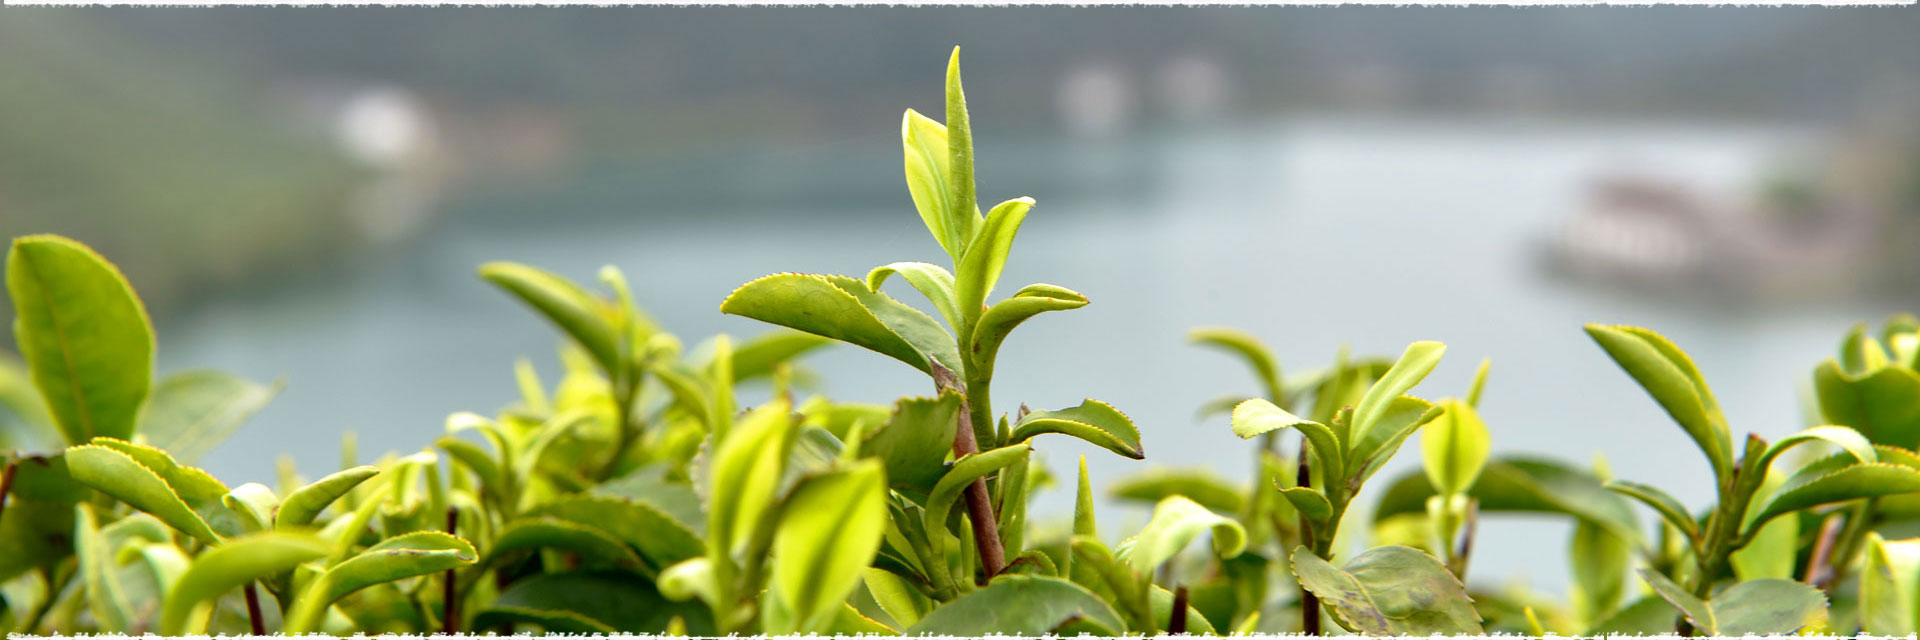 La fabrication des thés verts chinois